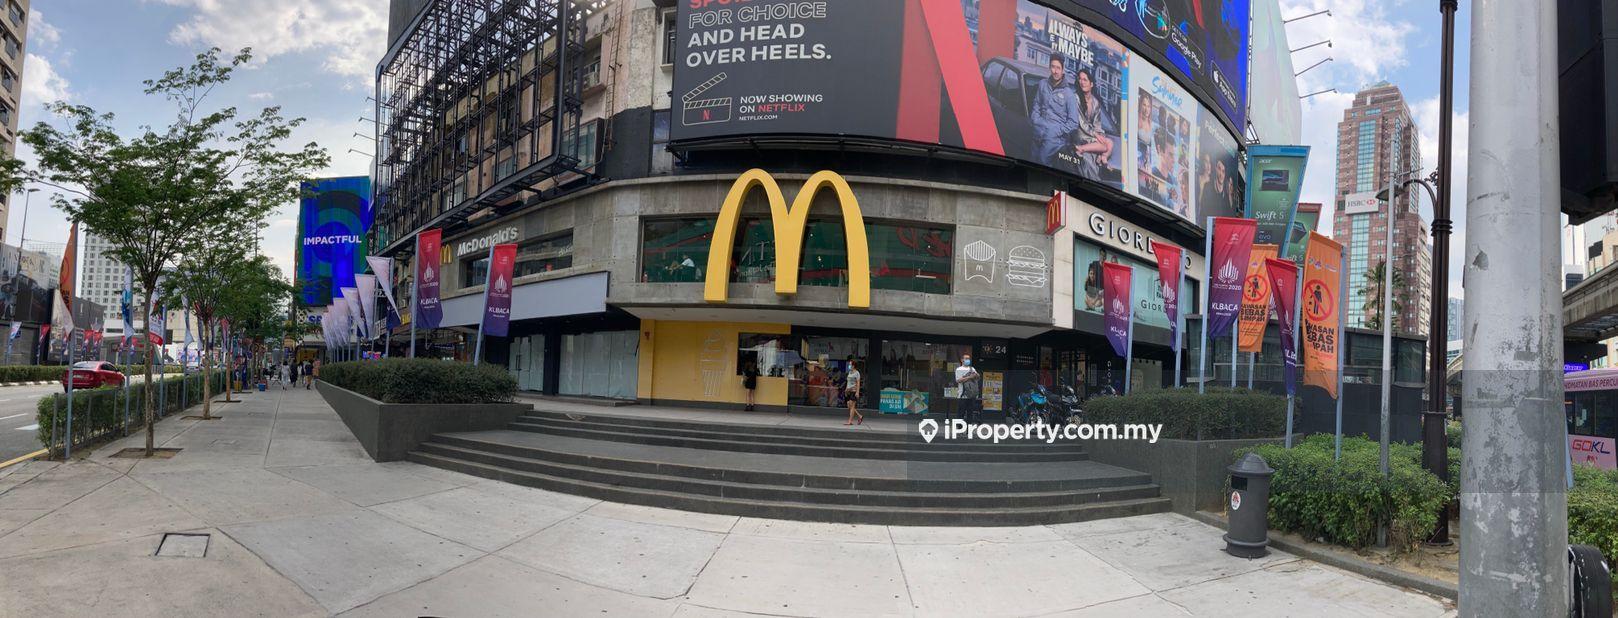 Bukit Bintang, Pavilion, Berjaya Times Square, Bukit Bintang